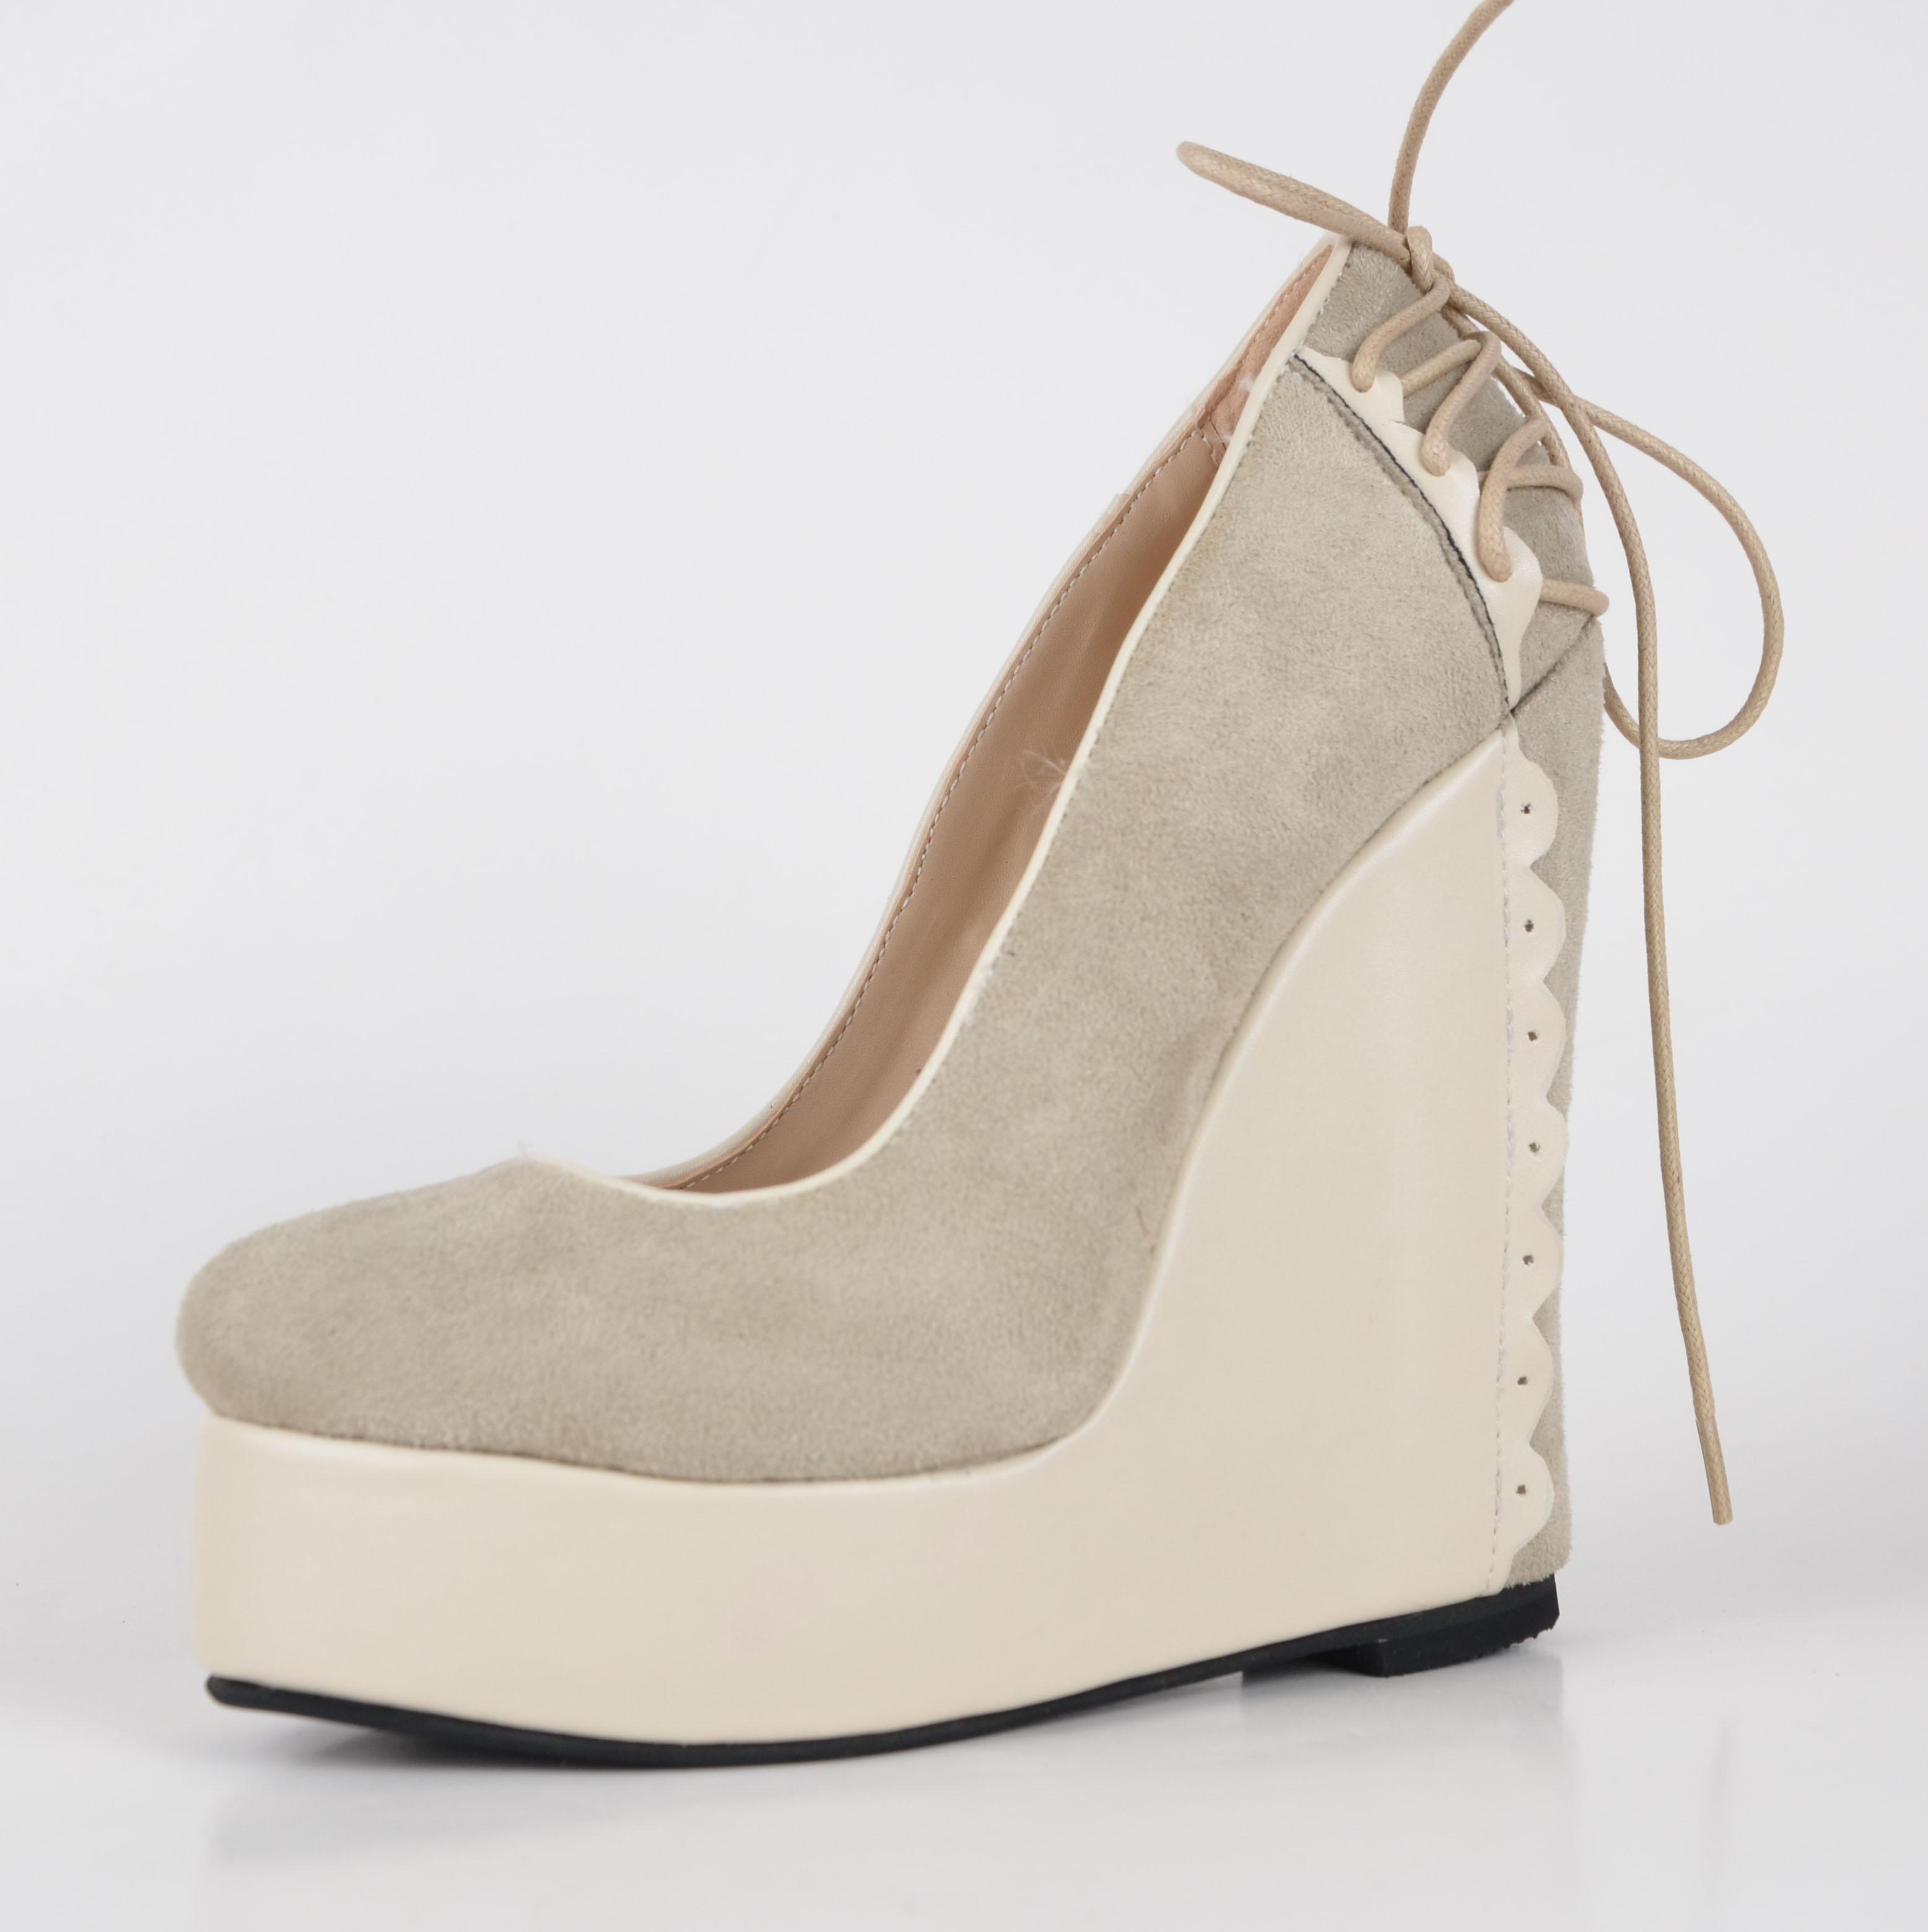 Dress Shoes High Heels